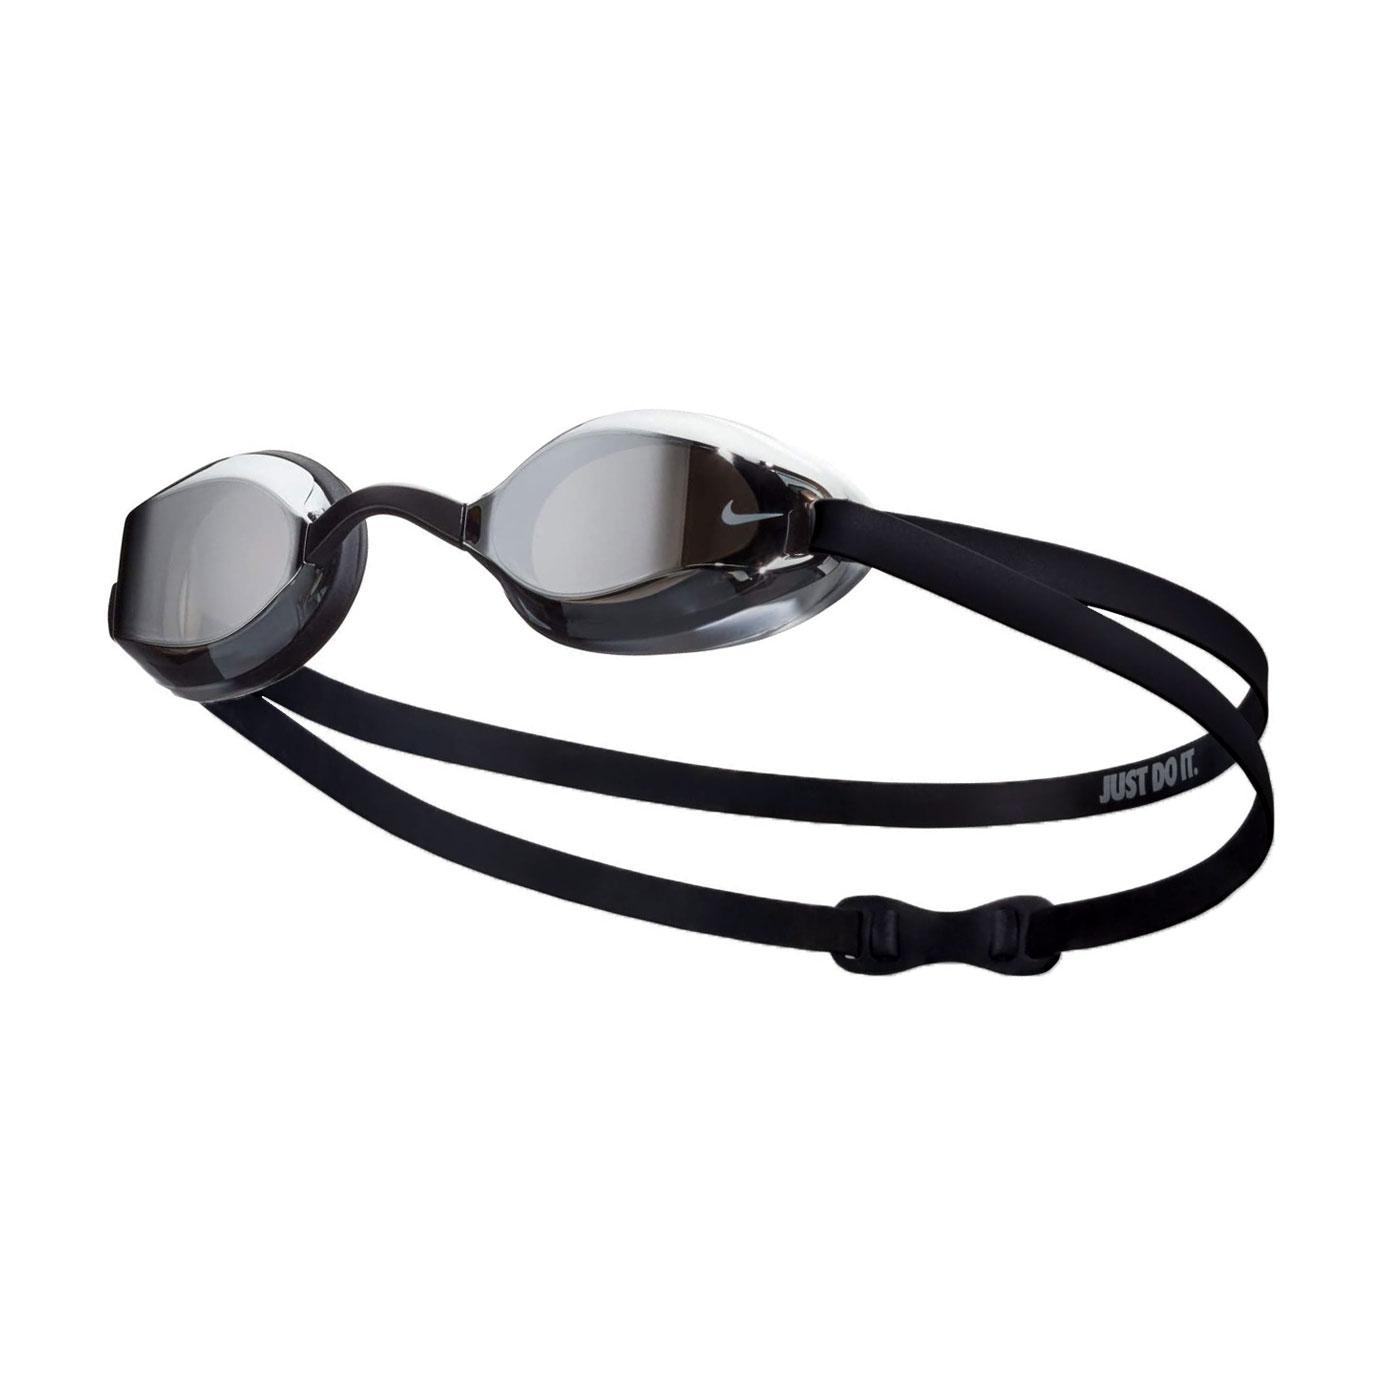 NIKE SWIM 兒童專業型泳鏡 NESSA180-040 - 黑白灰